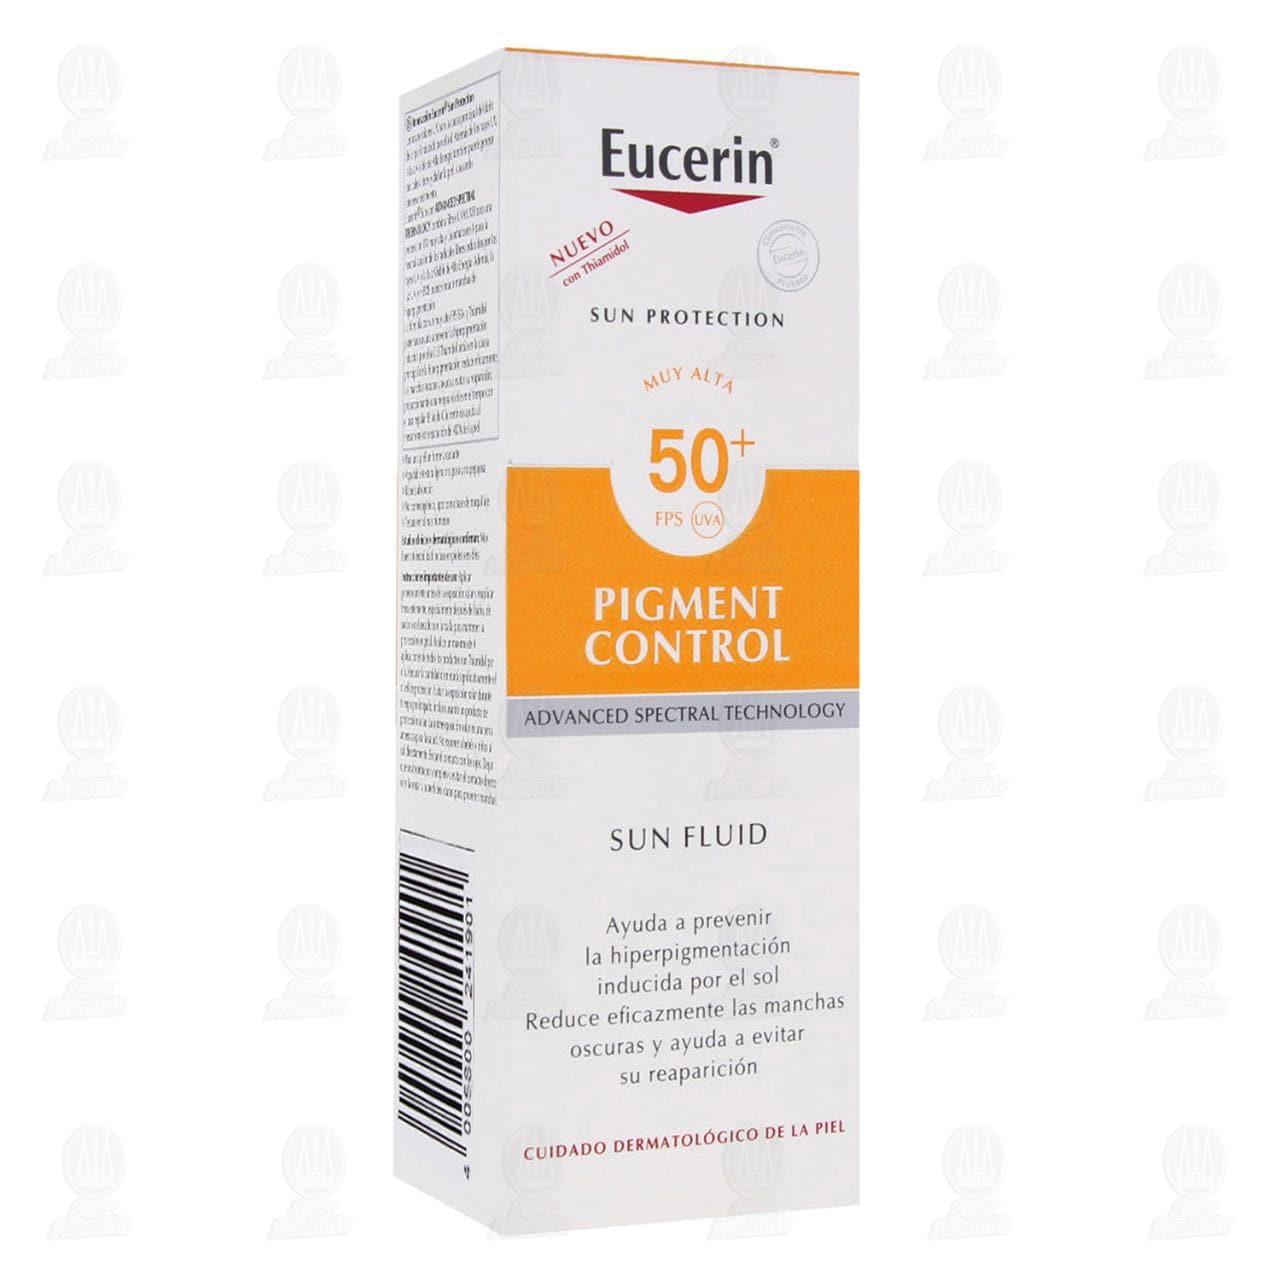 Comprar Eucerin Protector Solar Facial FPS 50+ Anti Pigment Sun, 50ml. en Farmacias Guadalajara